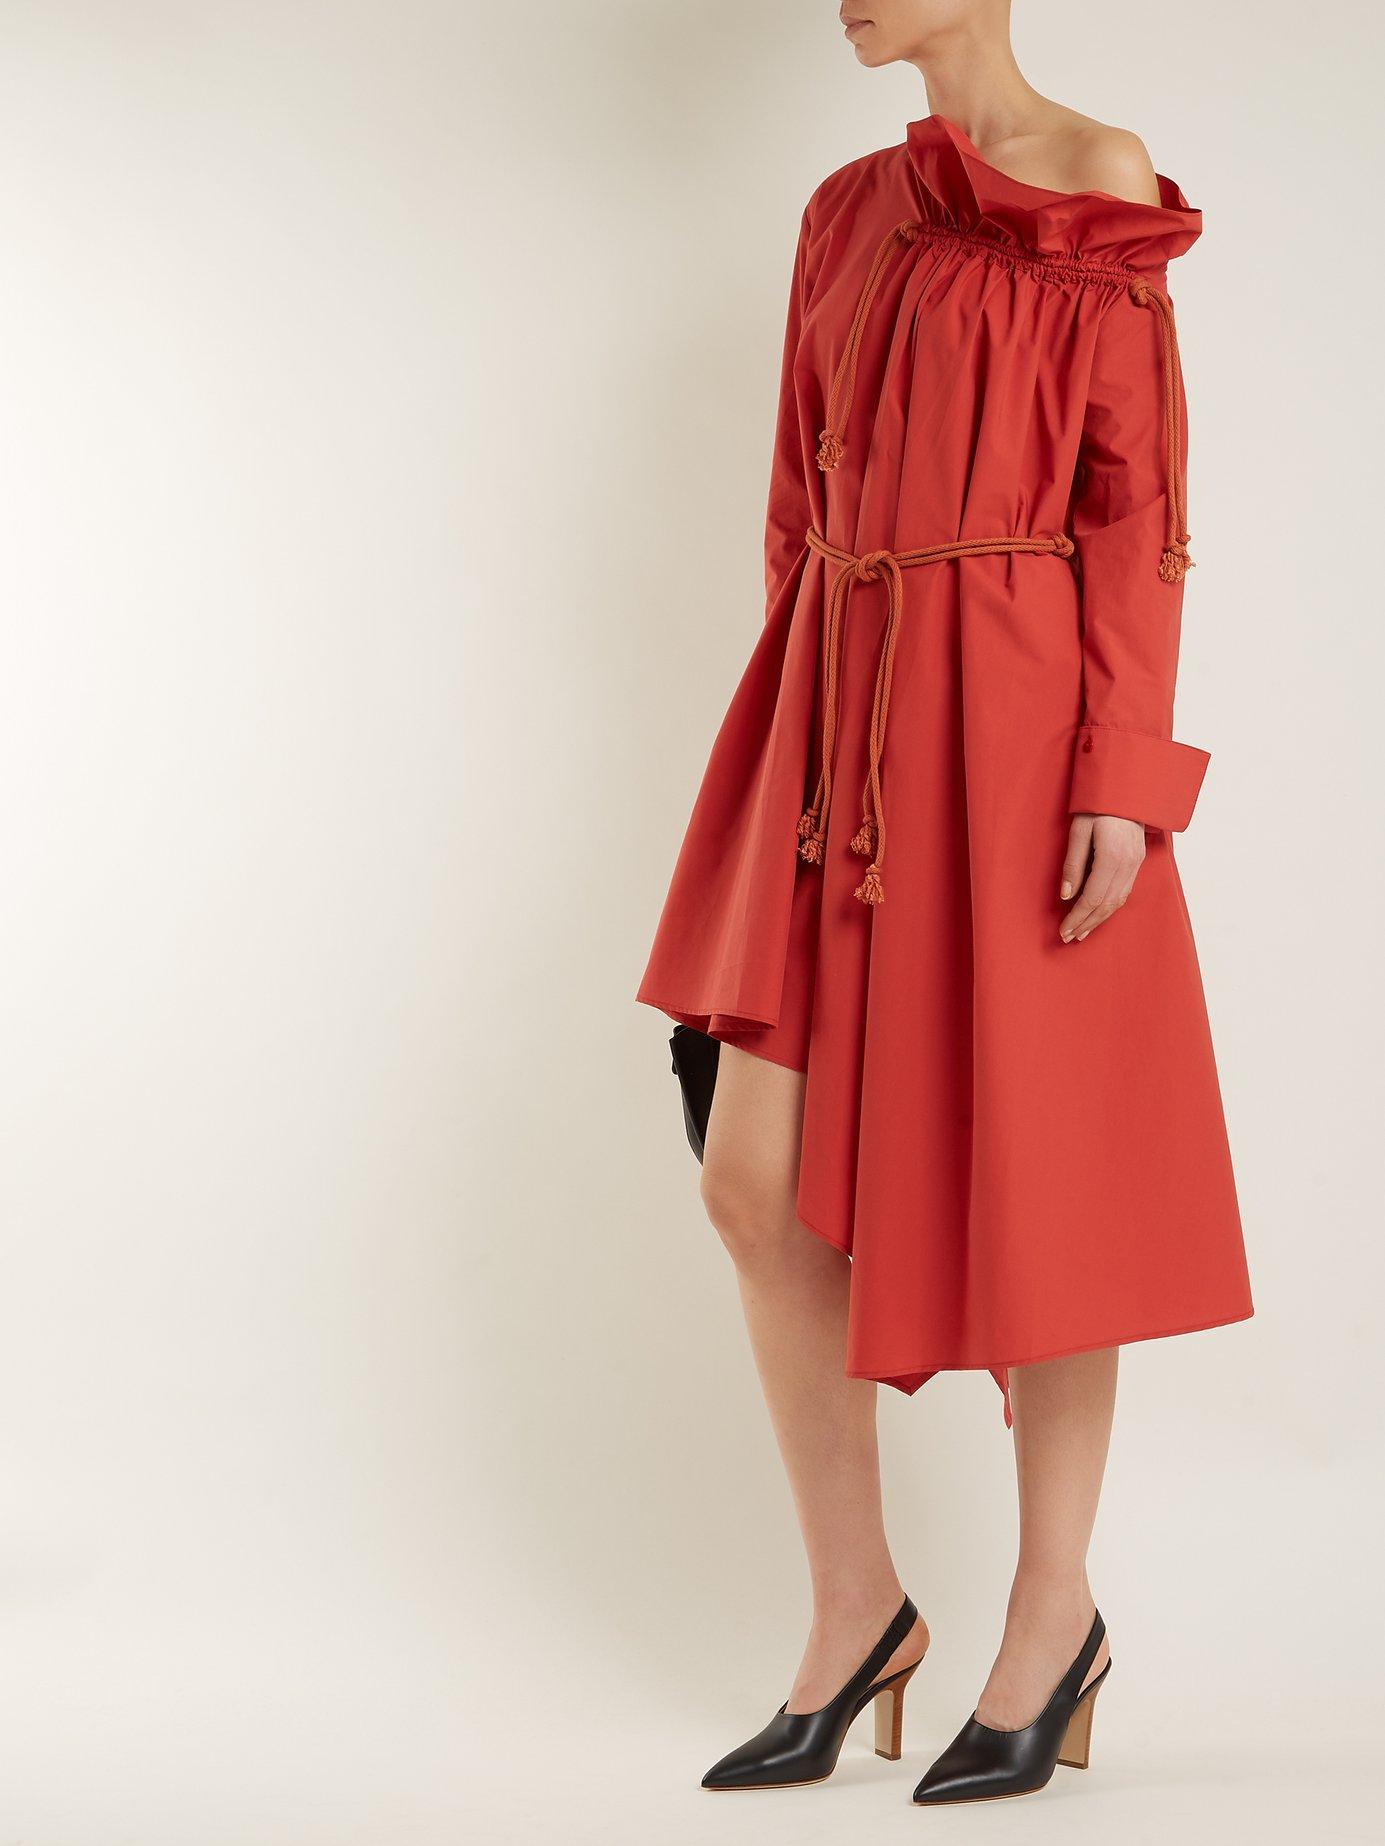 Asymmetric ruffle-neck dress by Palmer/Harding